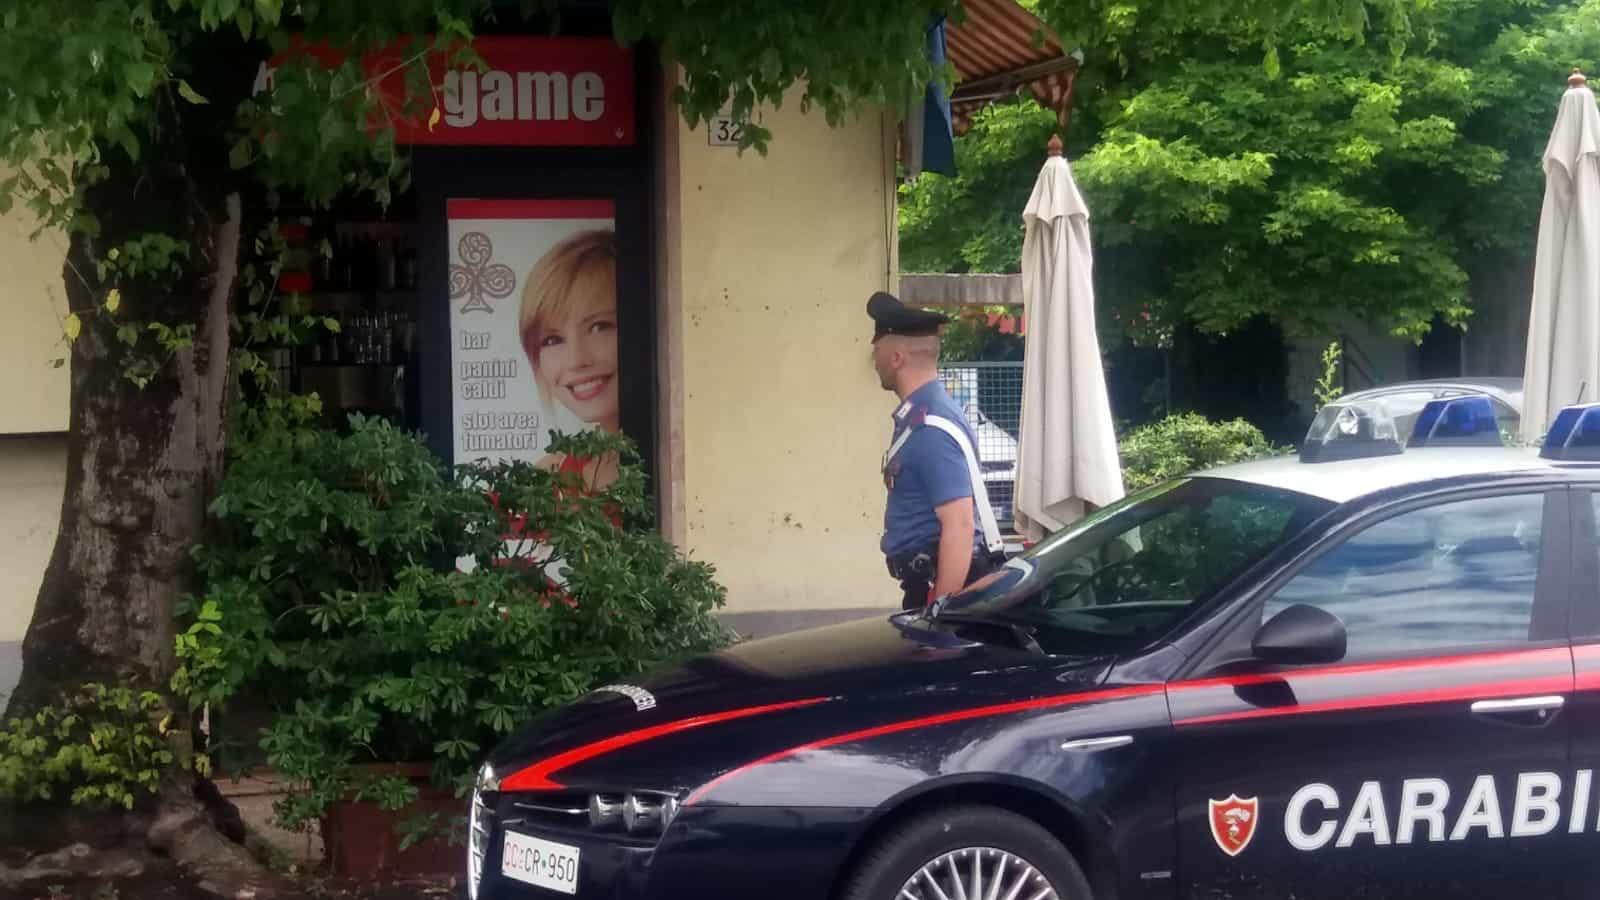 carabiniere-bar-games-2